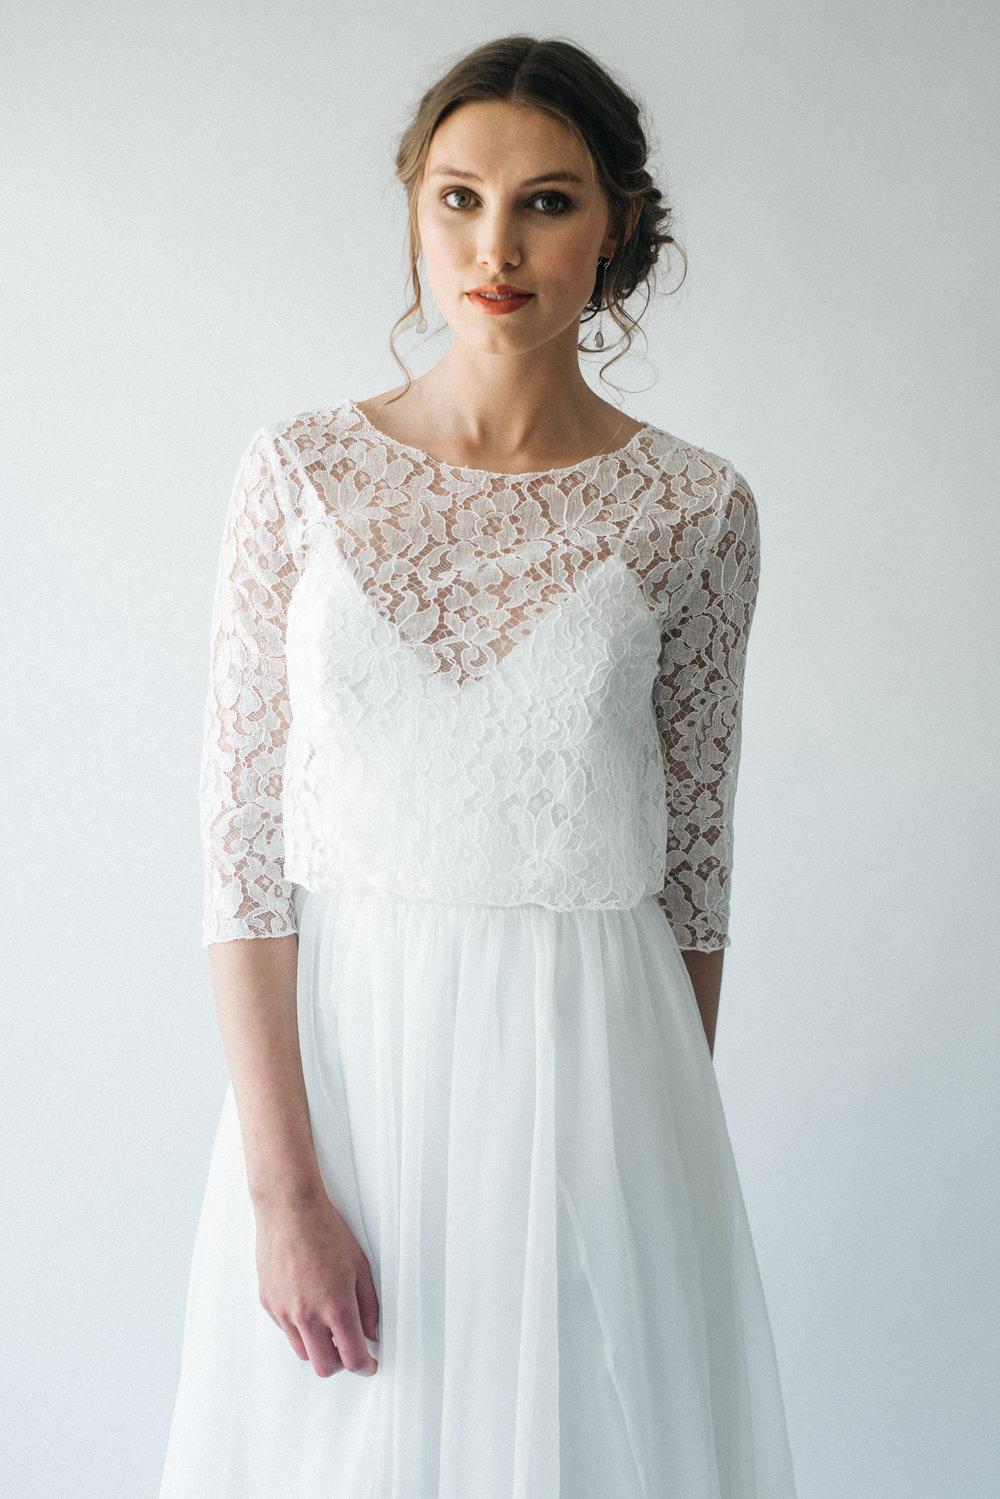 Lace Wedding Dress Cornwall.jpg